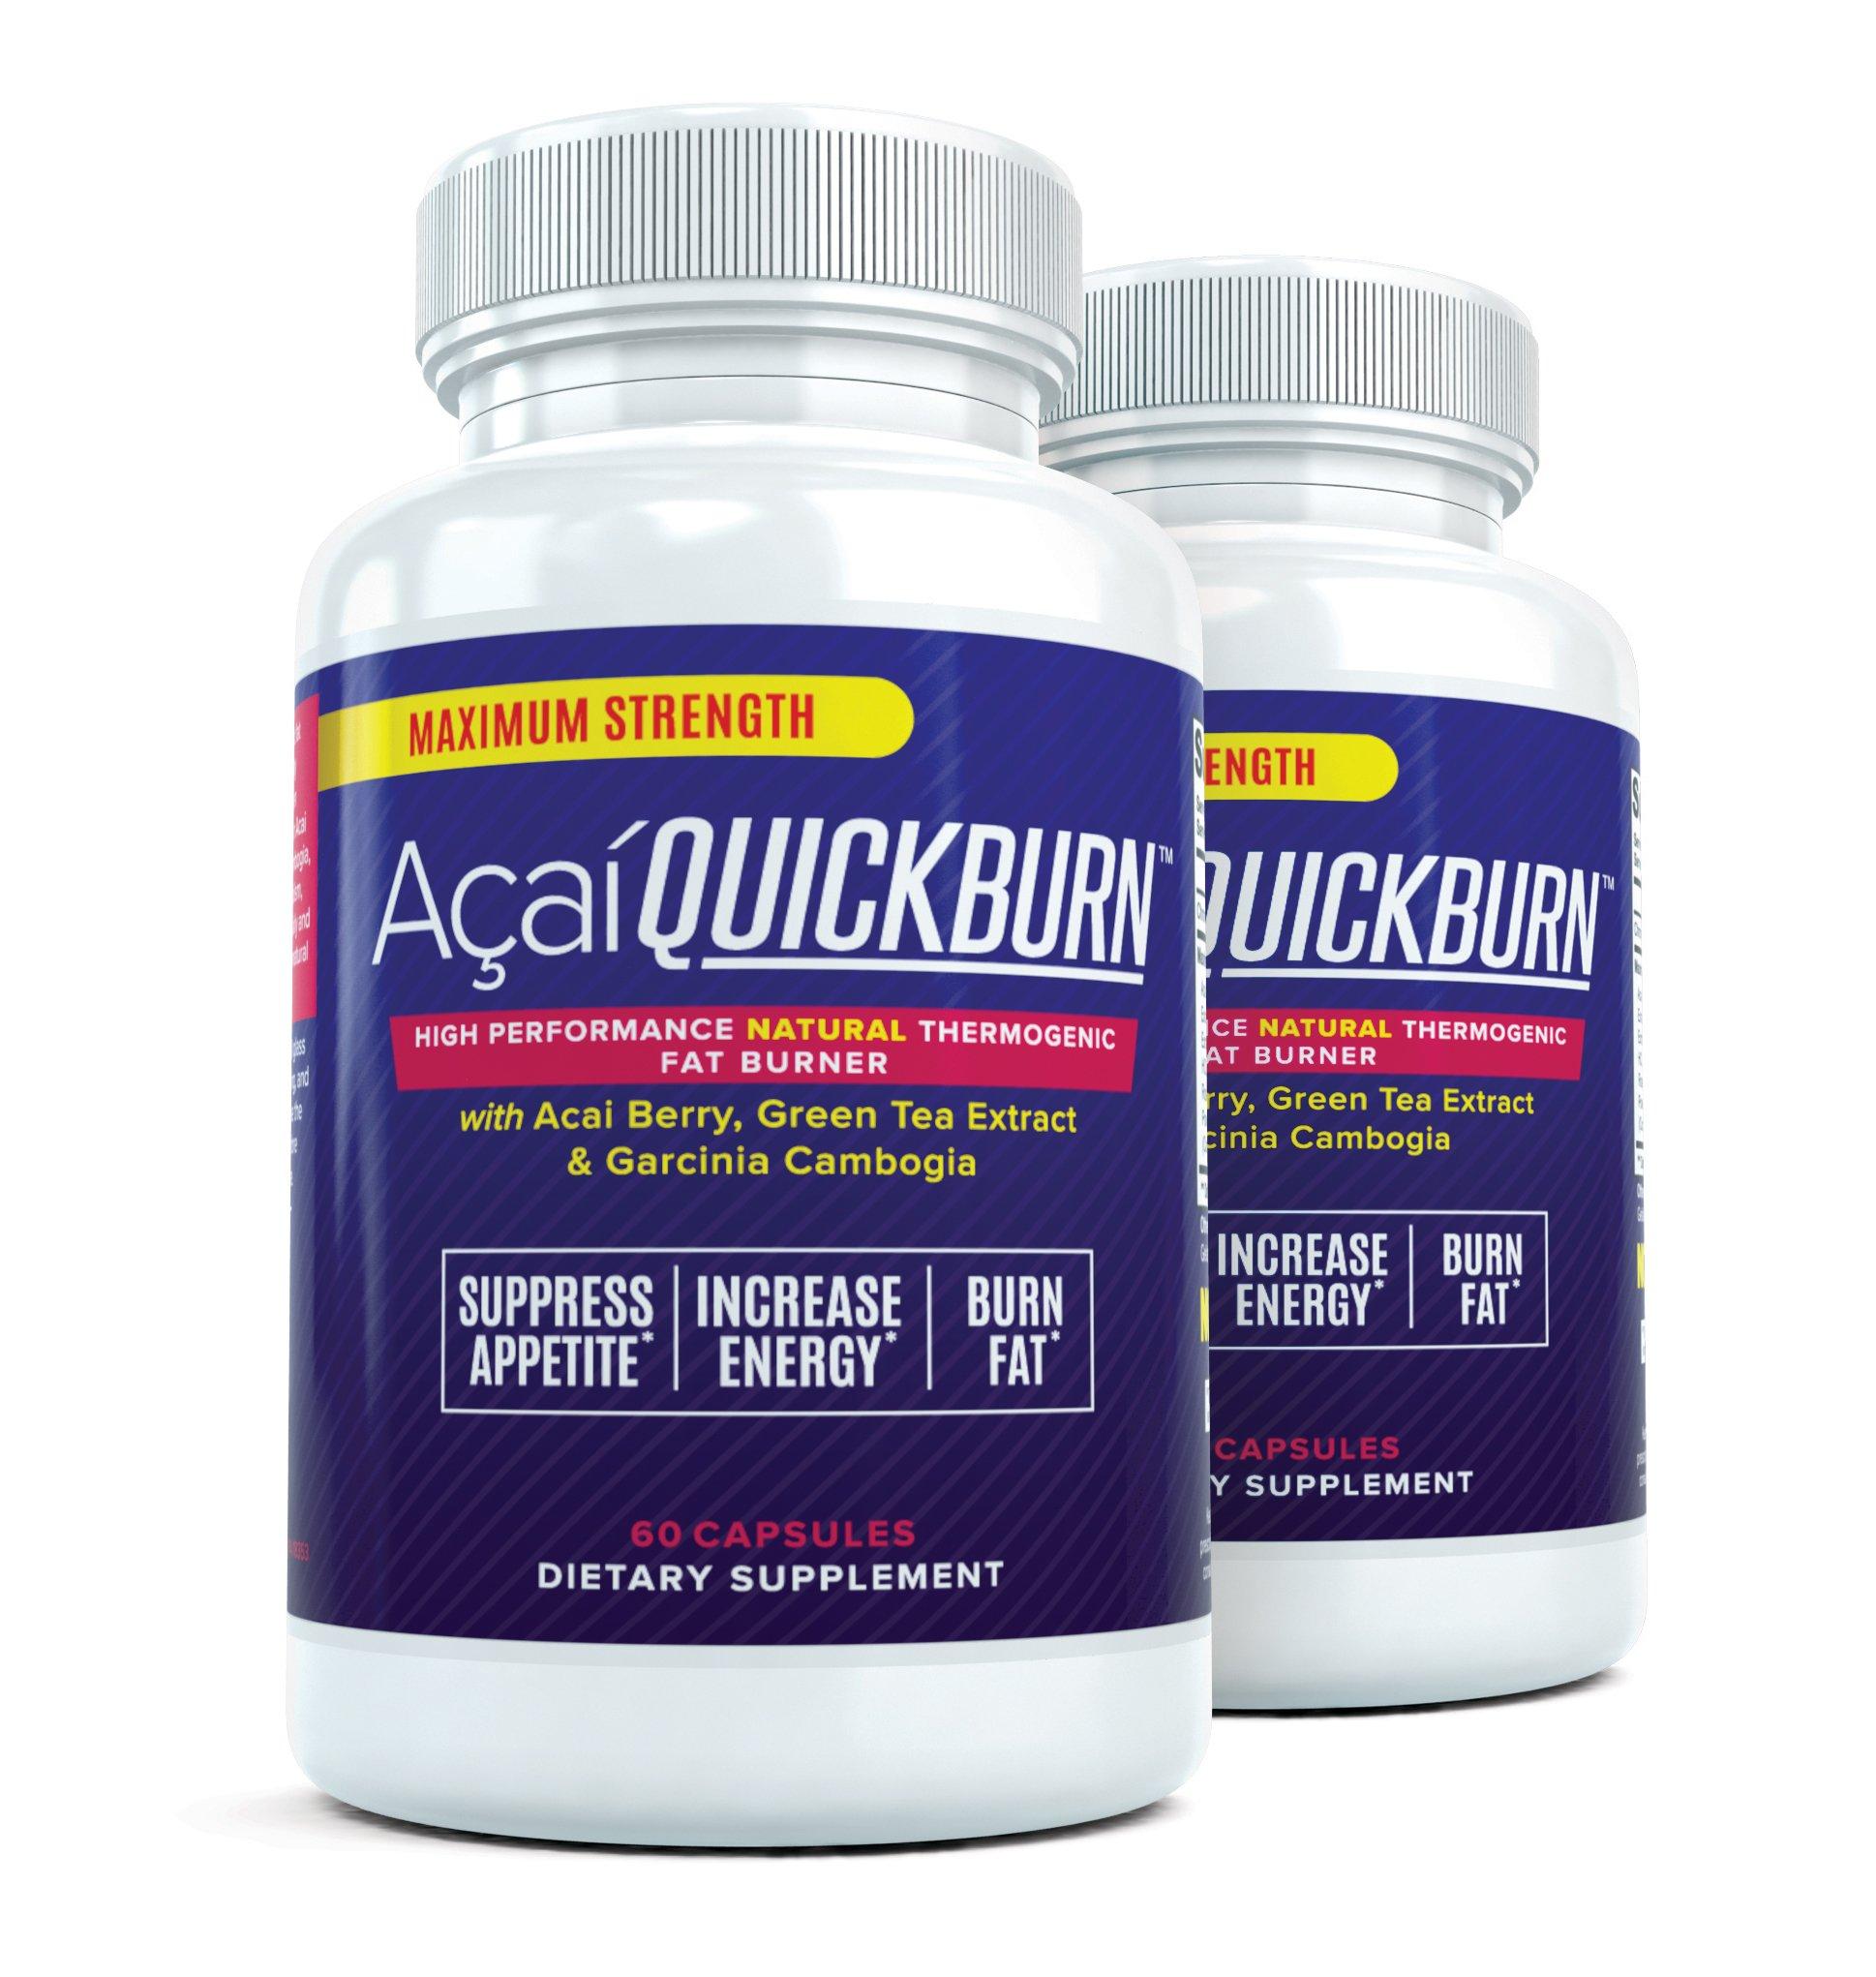 ACAI QUICK BURN (2 Bottles) High Performance Multi-Stage Fat Burner with Acai Berry & Garcinia Cambogia - 60 Capsules per Bottle